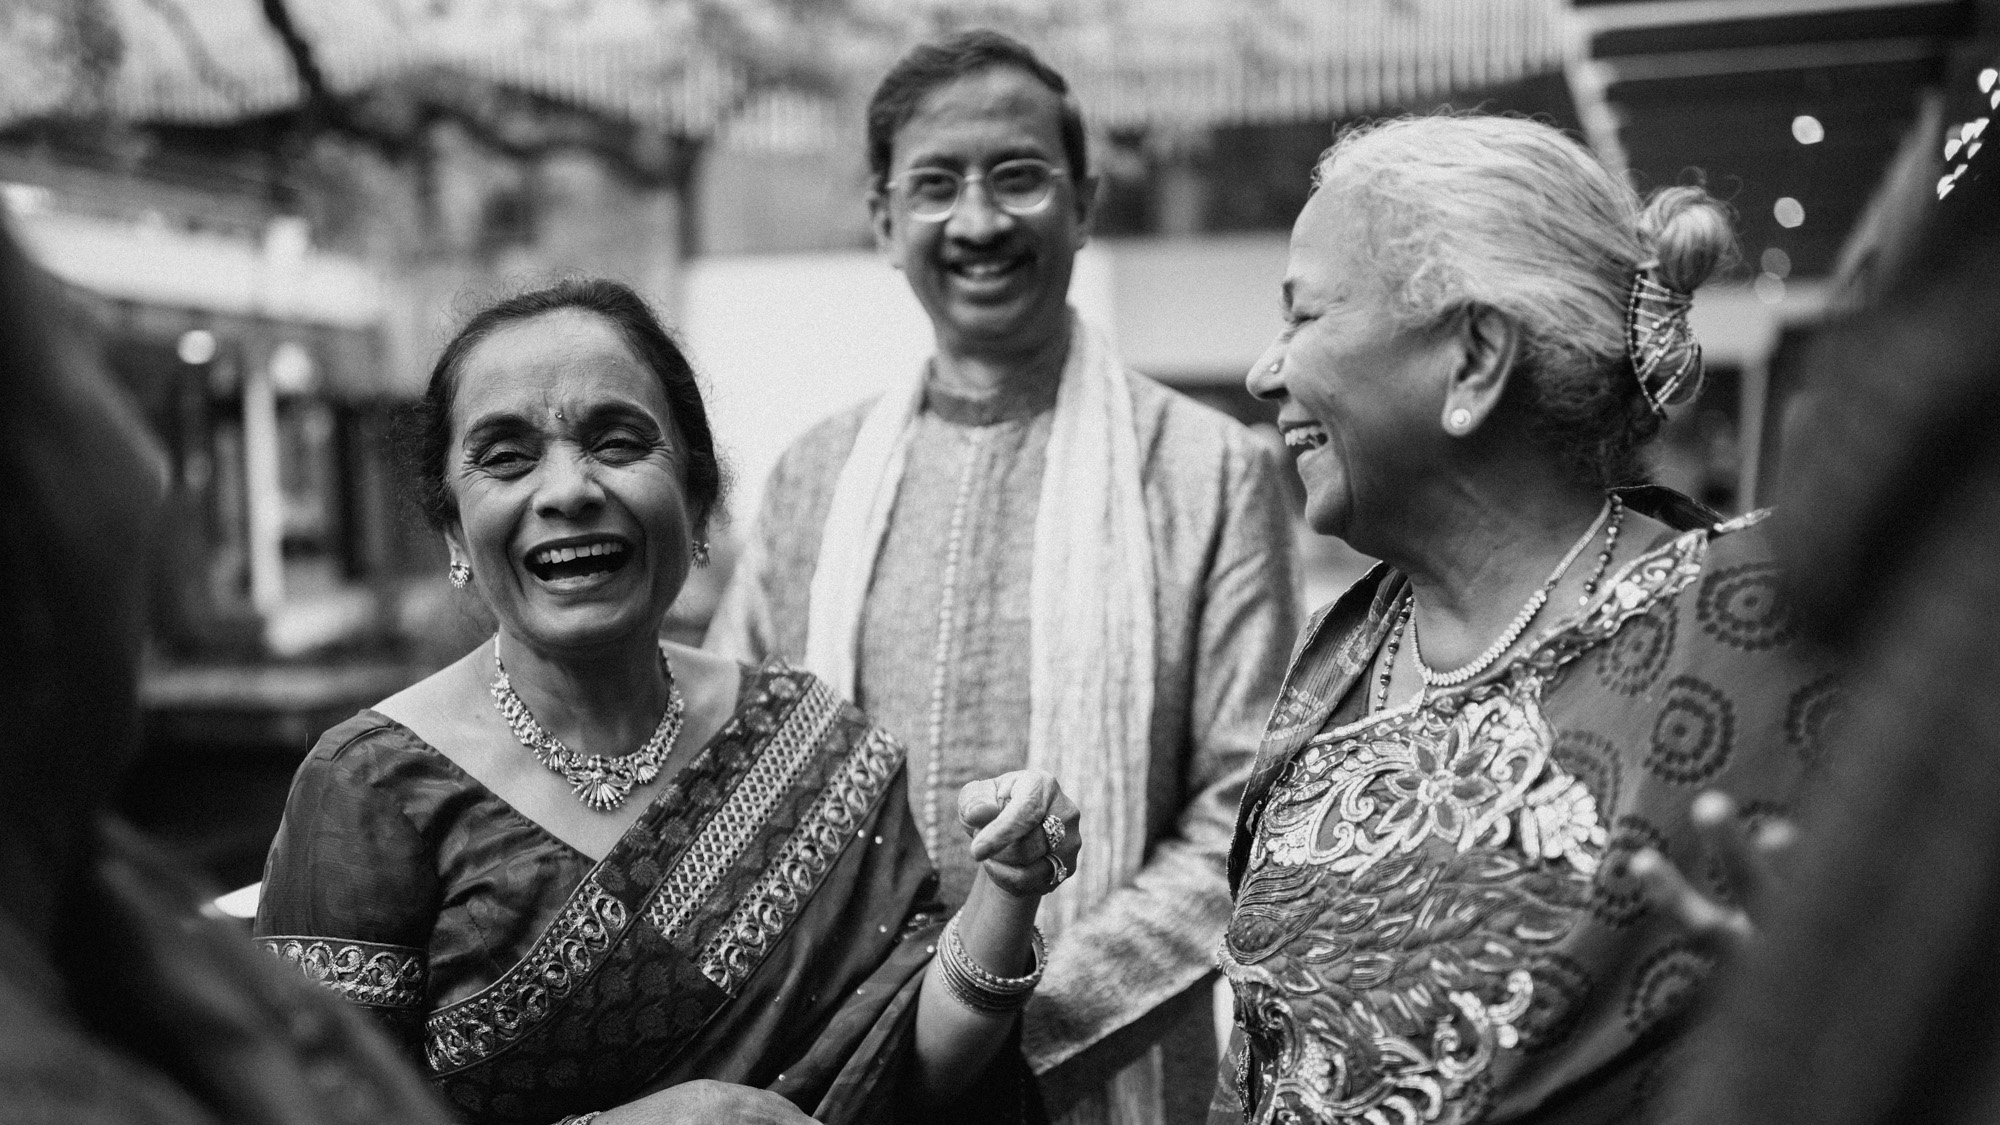 anu_maneesh_alec_vanderboom_Indian_wedding_photography-0025.jpg